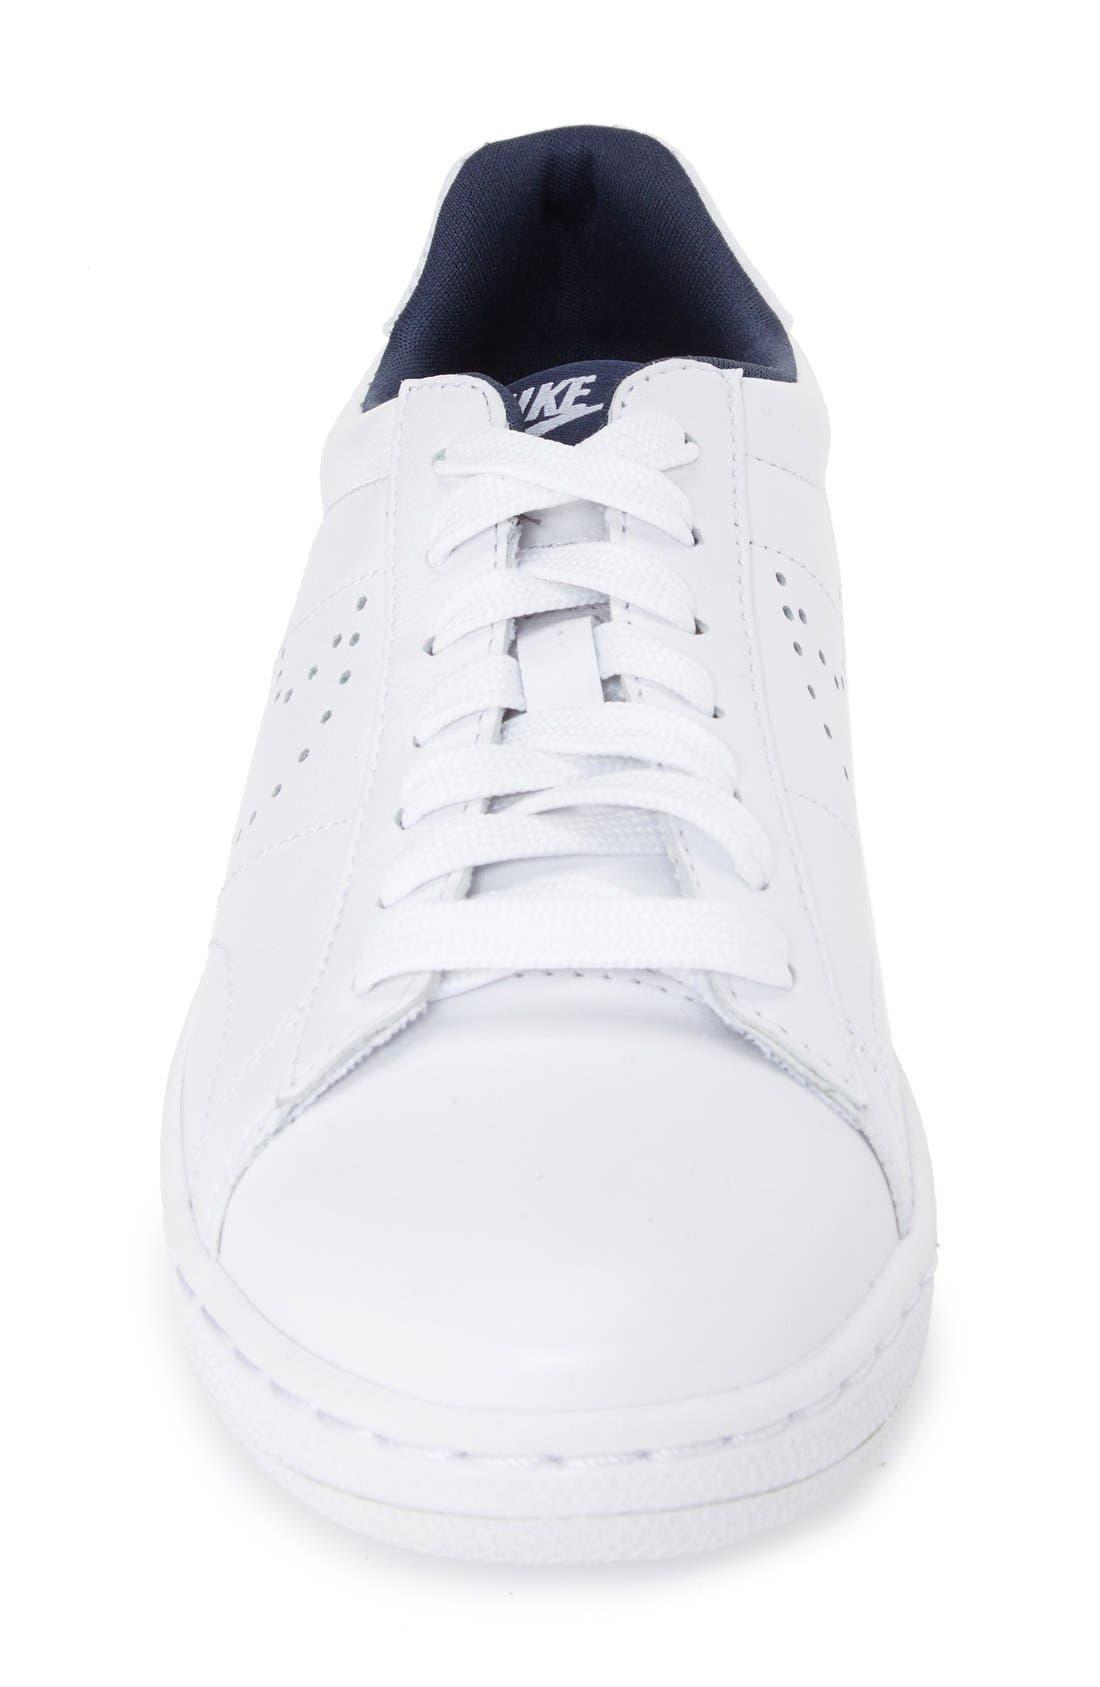 NIKE, 'Tennis Classic Ultra' Sneaker, Alternate thumbnail 3, color, 100